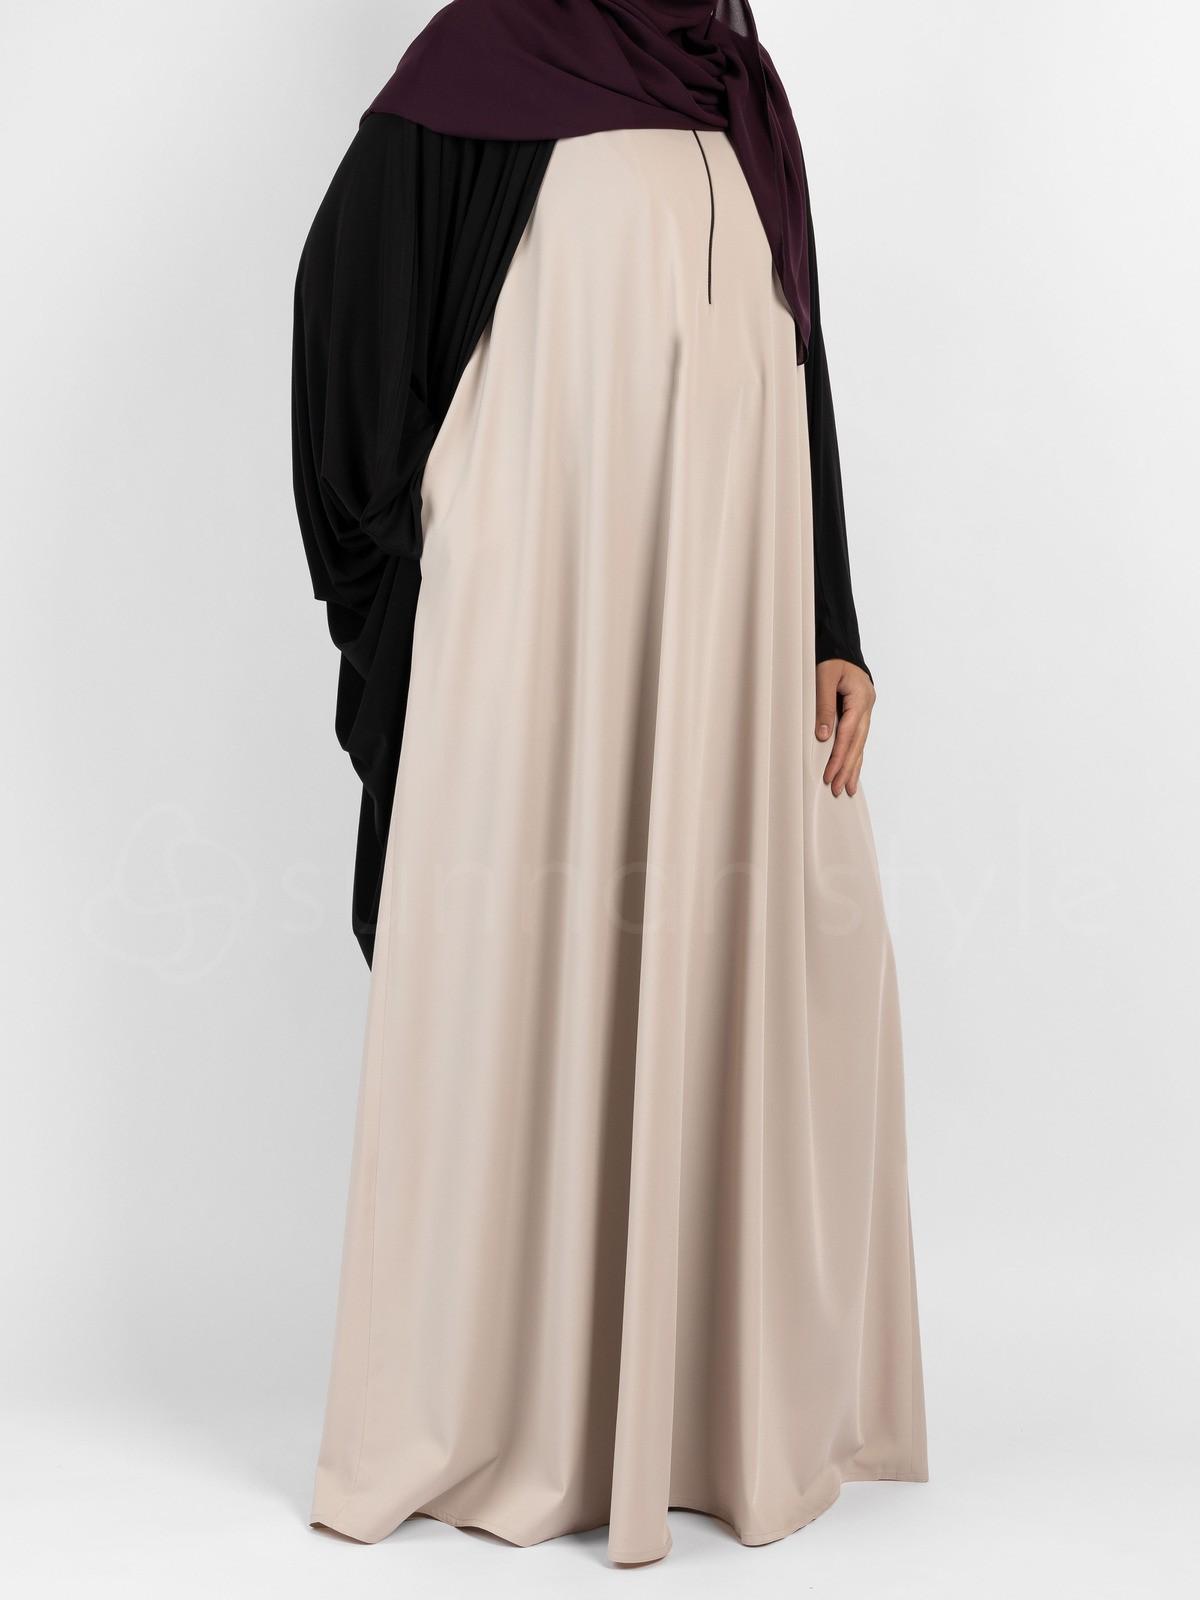 Sunnah Style - Essentials Sleeveless Abaya (Sahara)